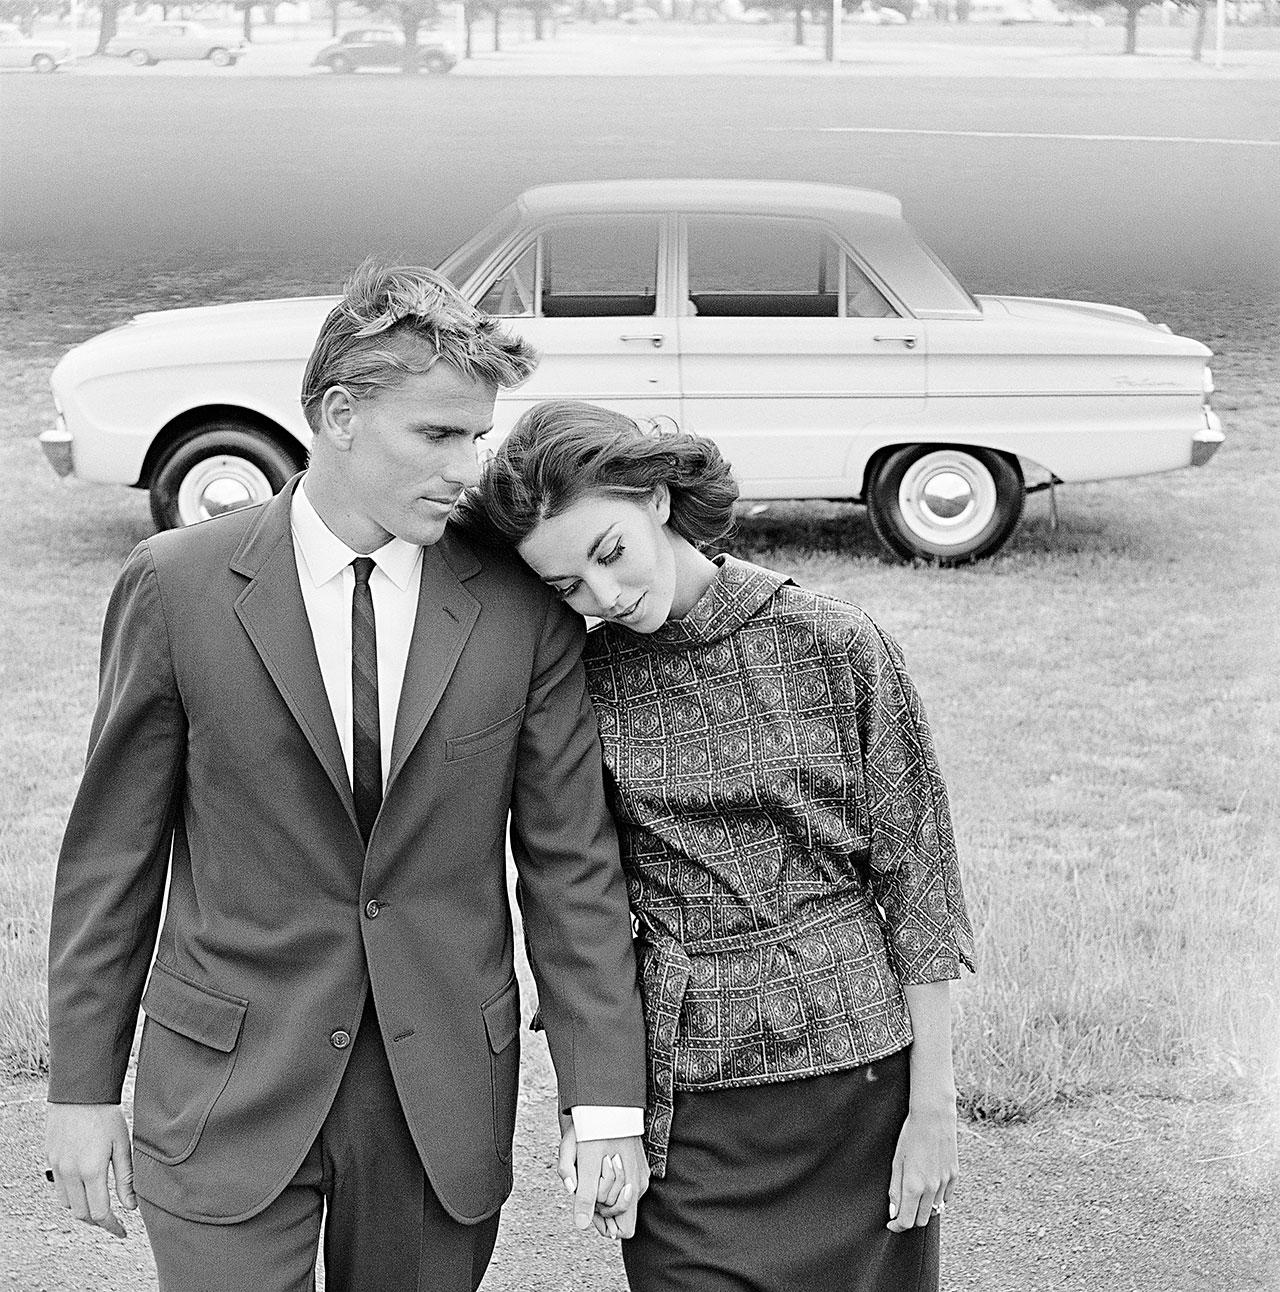 https://pleasurephoto.files.wordpress.com/2017/12/margot-mckendry-murray-rose-ford-falcon-1963-b.jpg